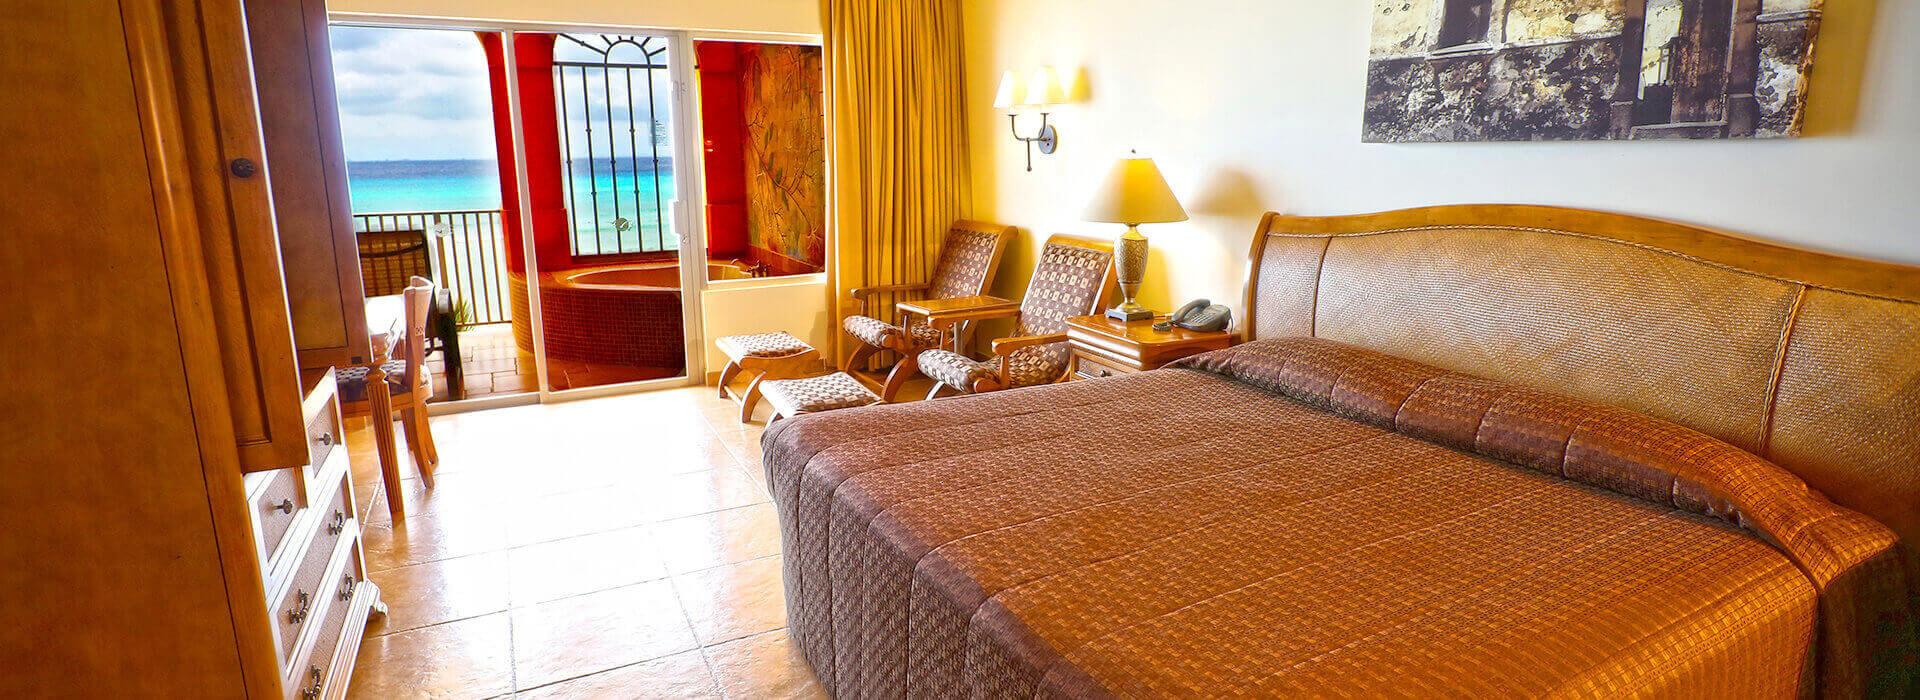 amplia habitación con cama king size